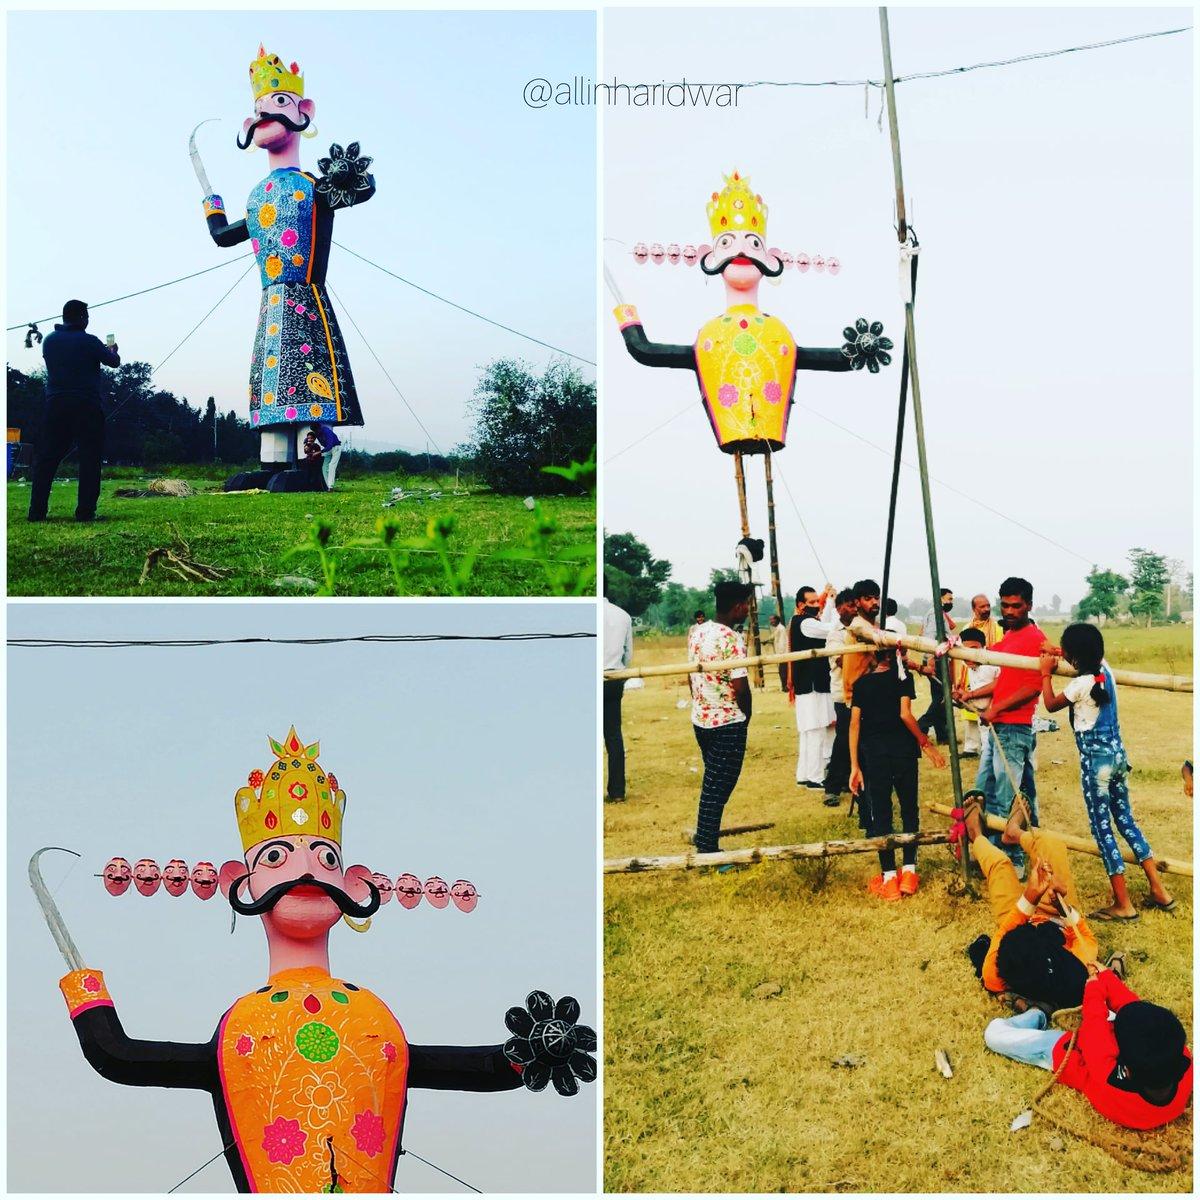 Dussehra celebration in Haridwar . . #haridwar #RavanDahan #Dussehra #Dusshera2020 #uttarakhand https://t.co/MuwZzgFaUw